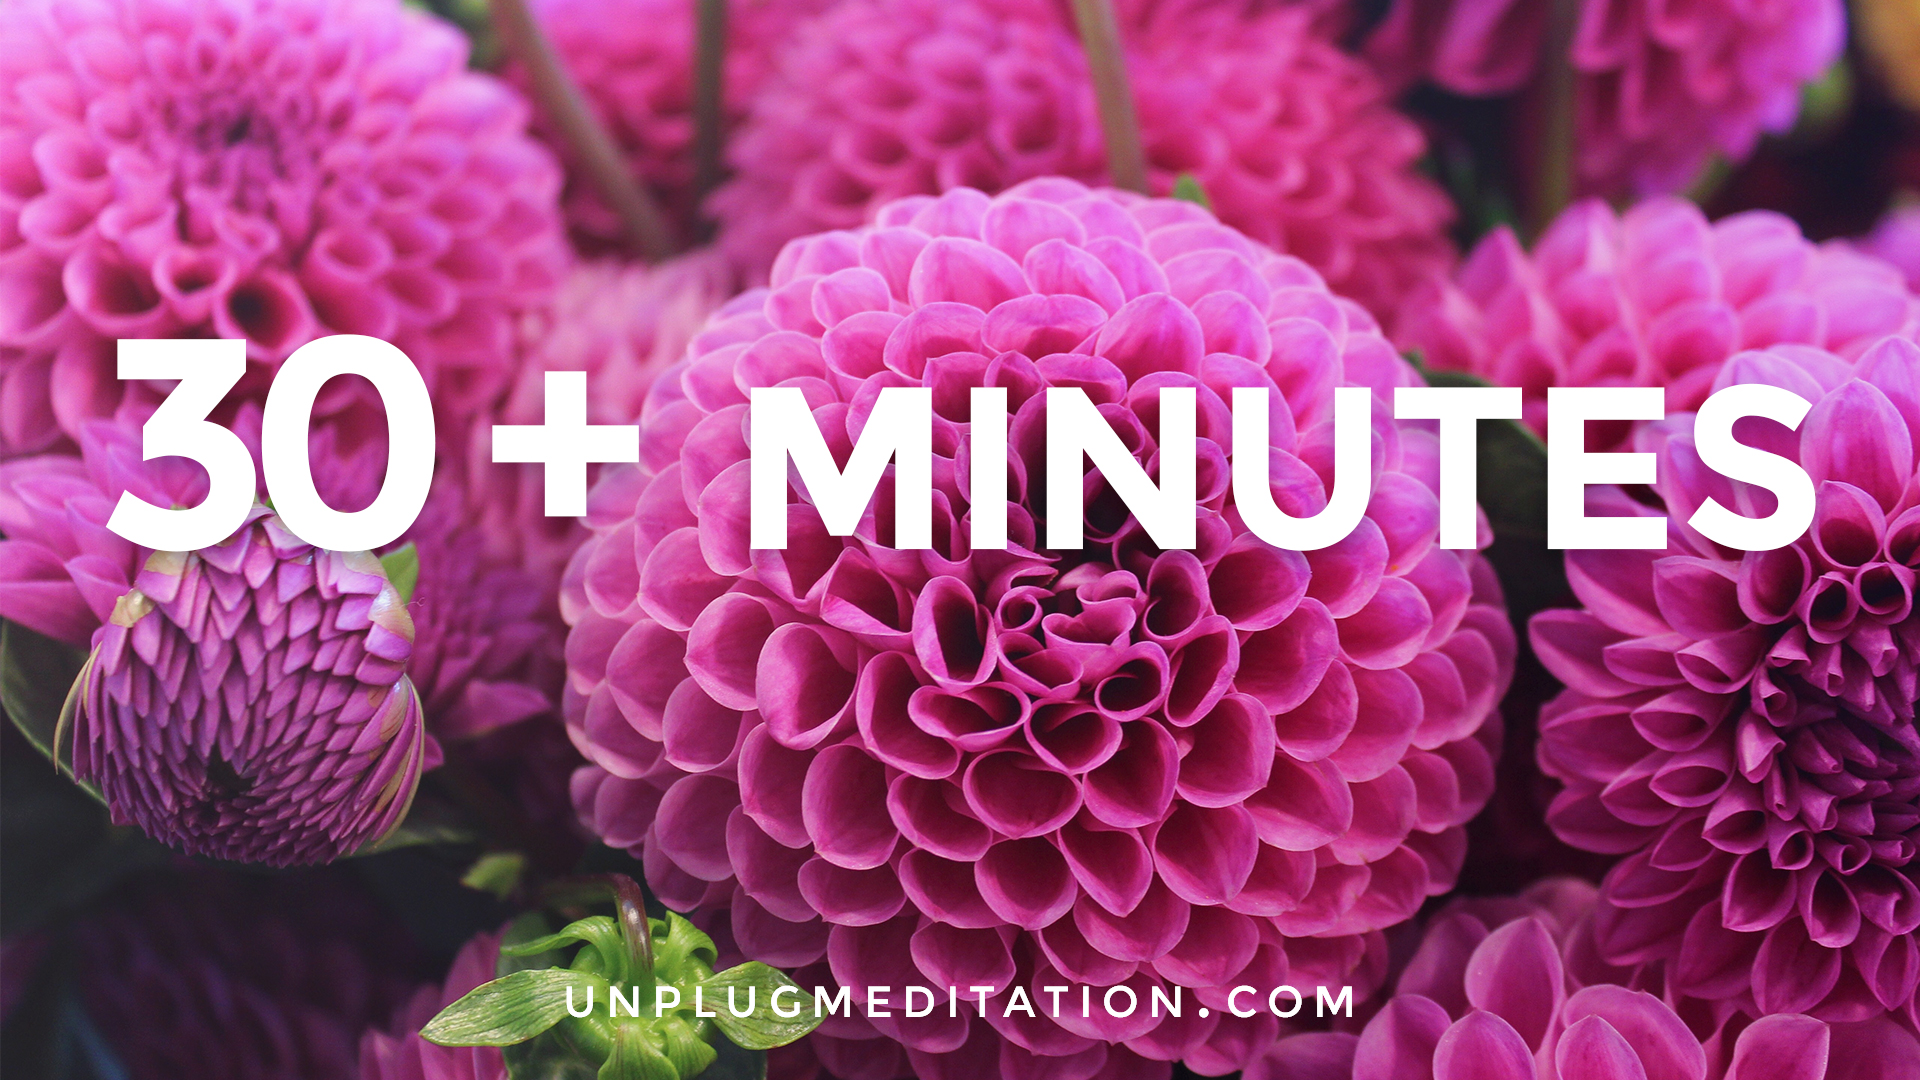 Unplug-Meditation-VHX-Covers-Artwork_30+-MINUTES.jpg